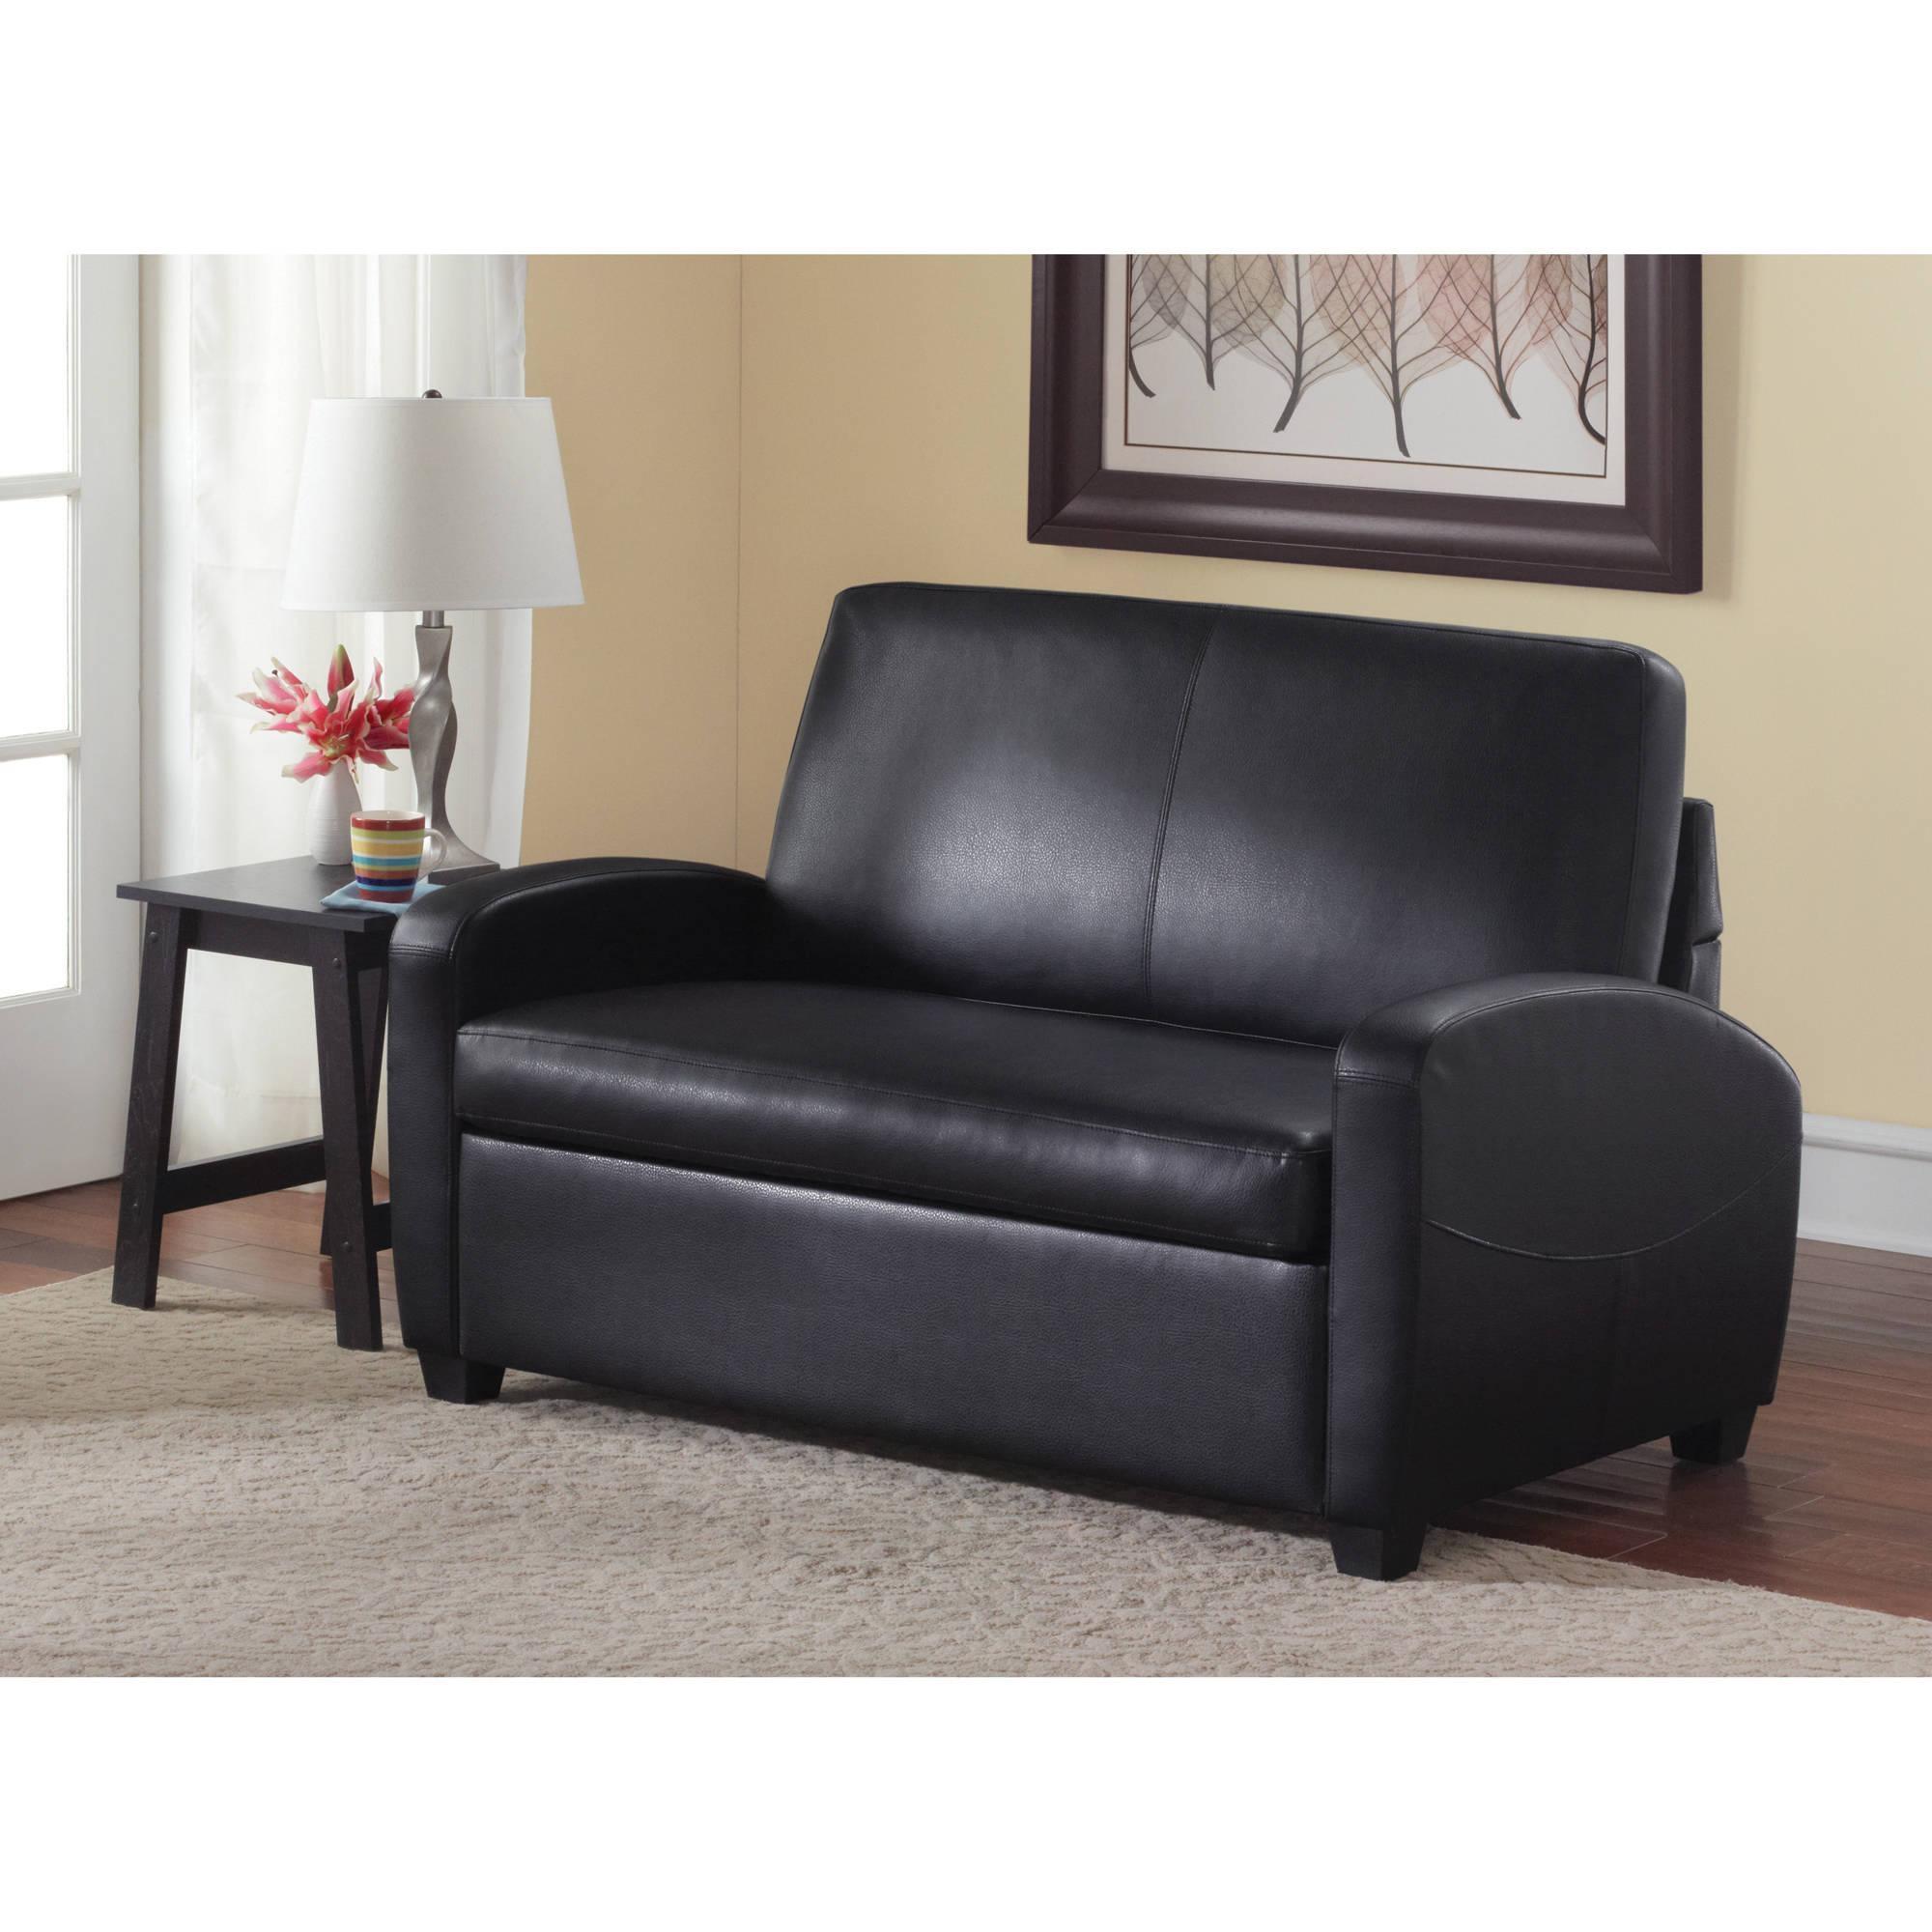 Mainstays Sofa Sleeper, Black – Walmart With Mainstays Sleeper Sofas (Image 16 of 20)